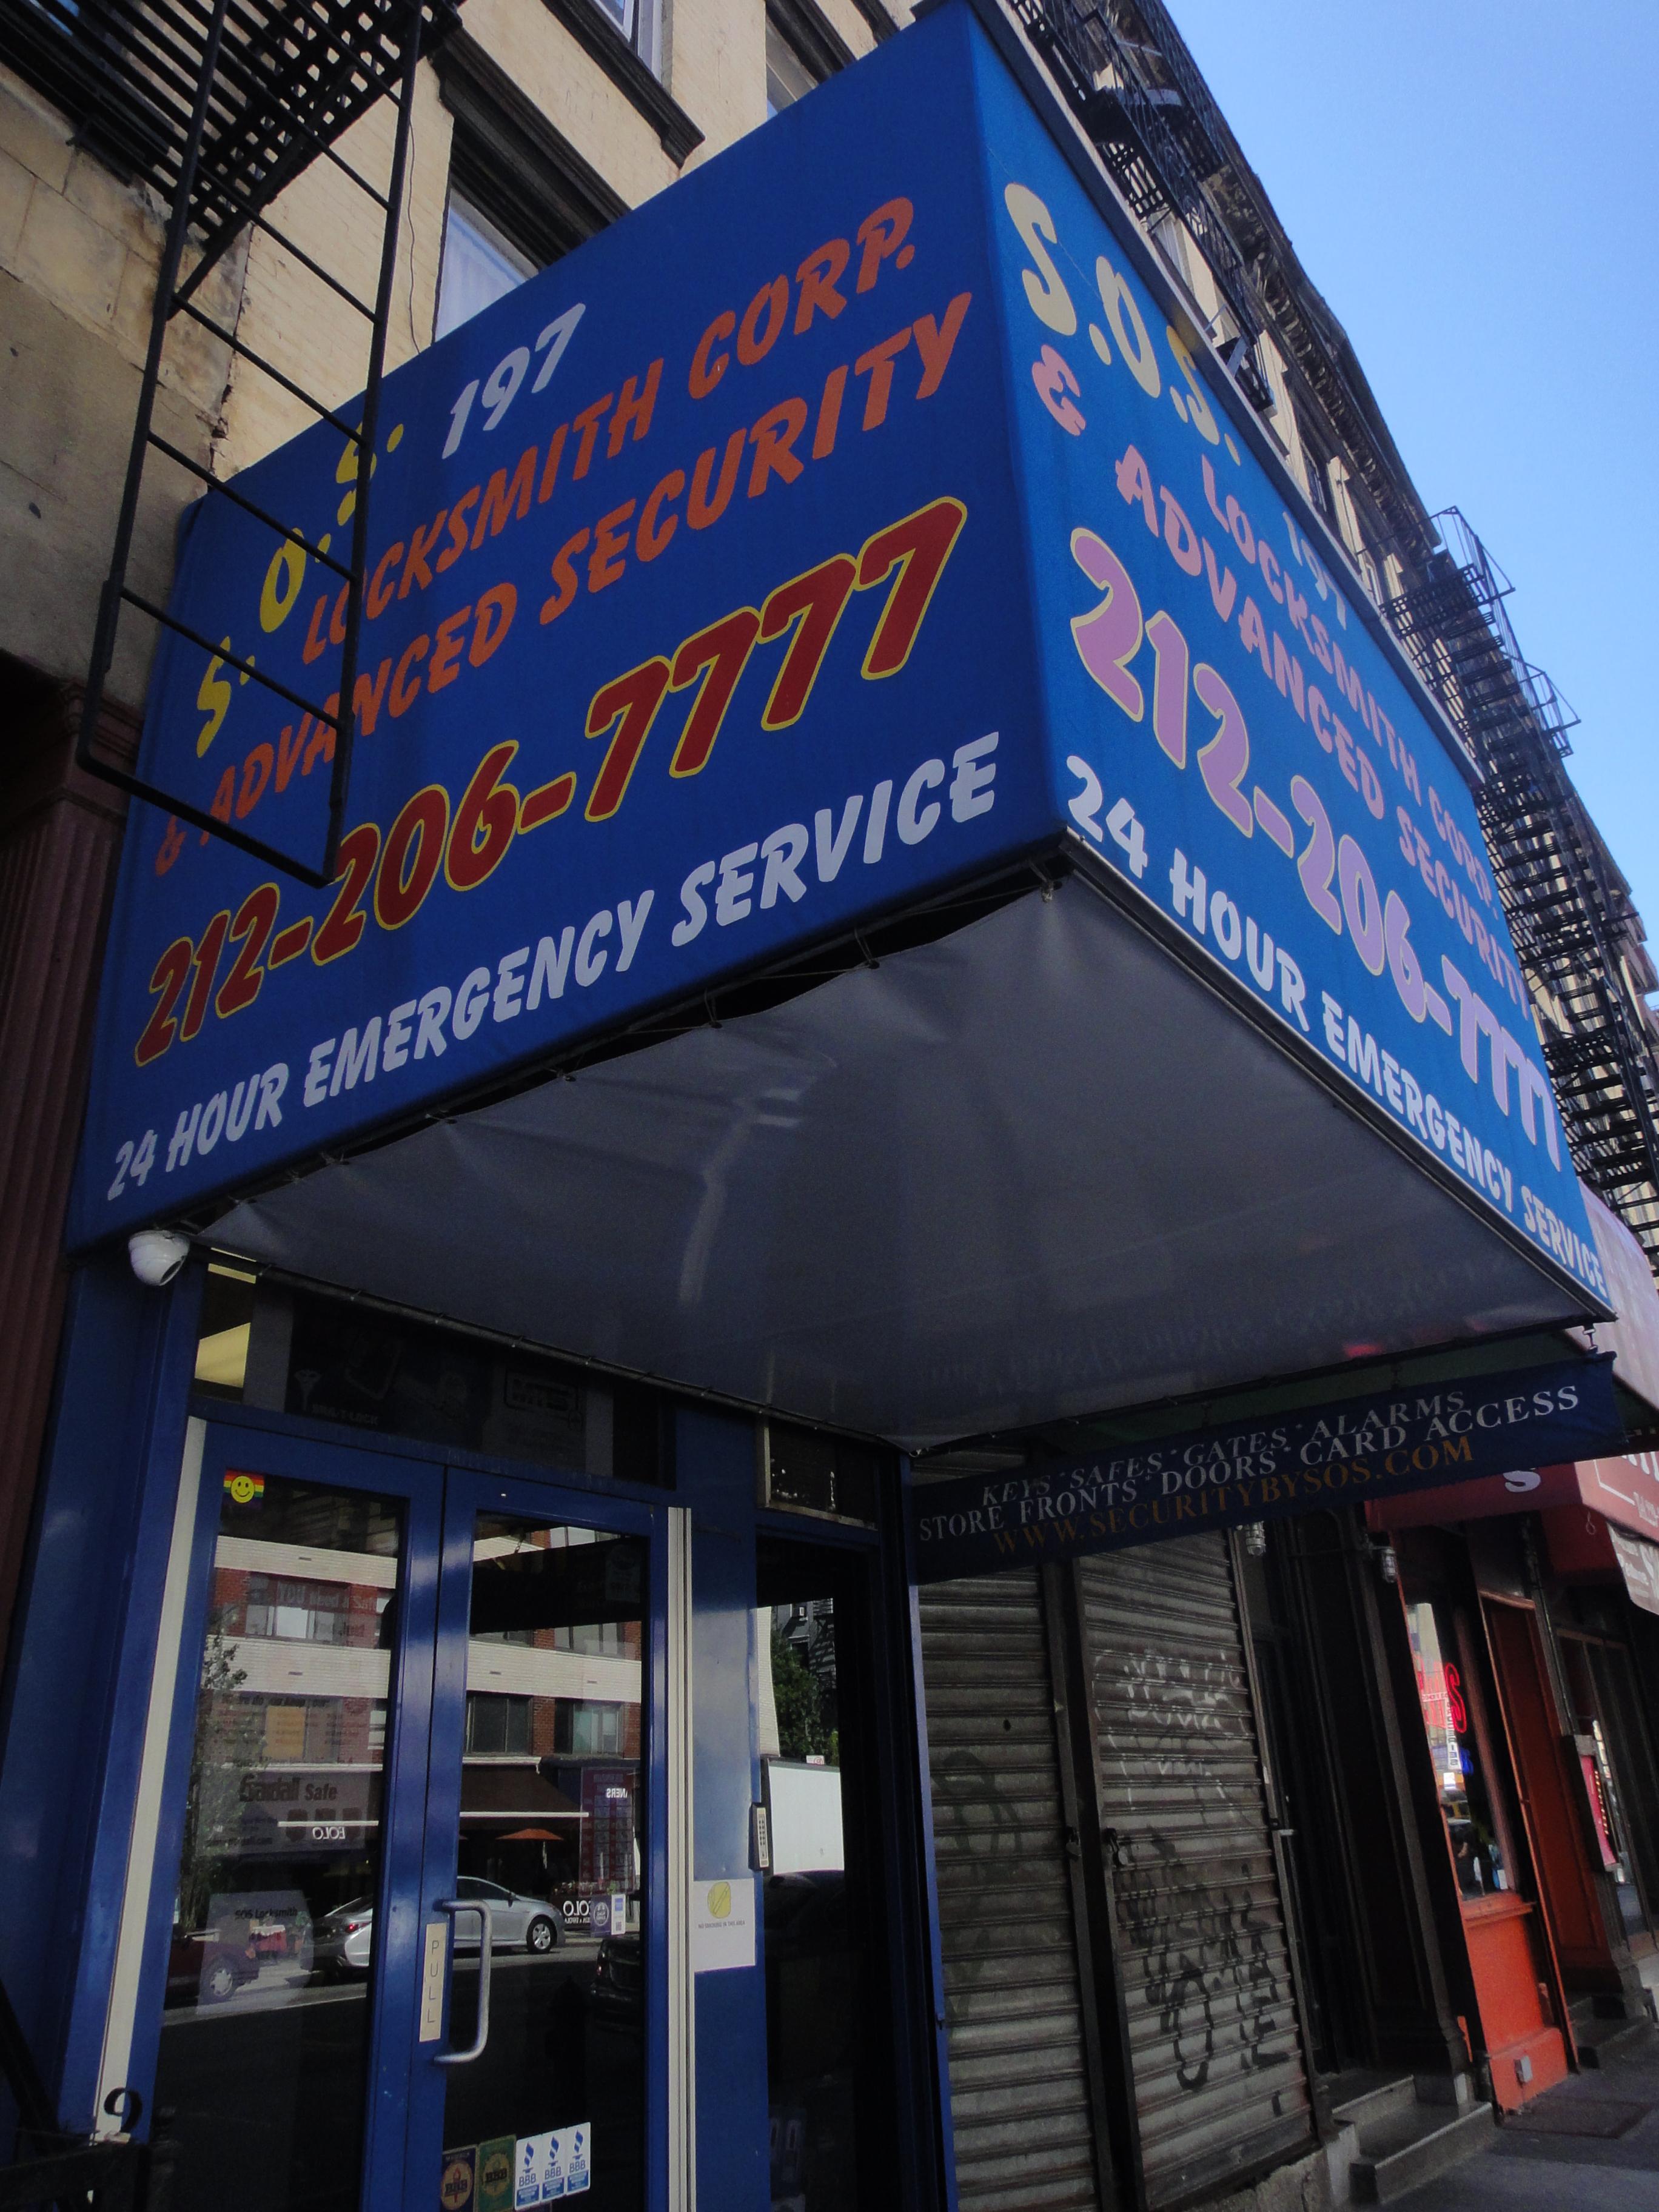 Sos Locksmith Nyc New York New York Ny Localdatabase Com